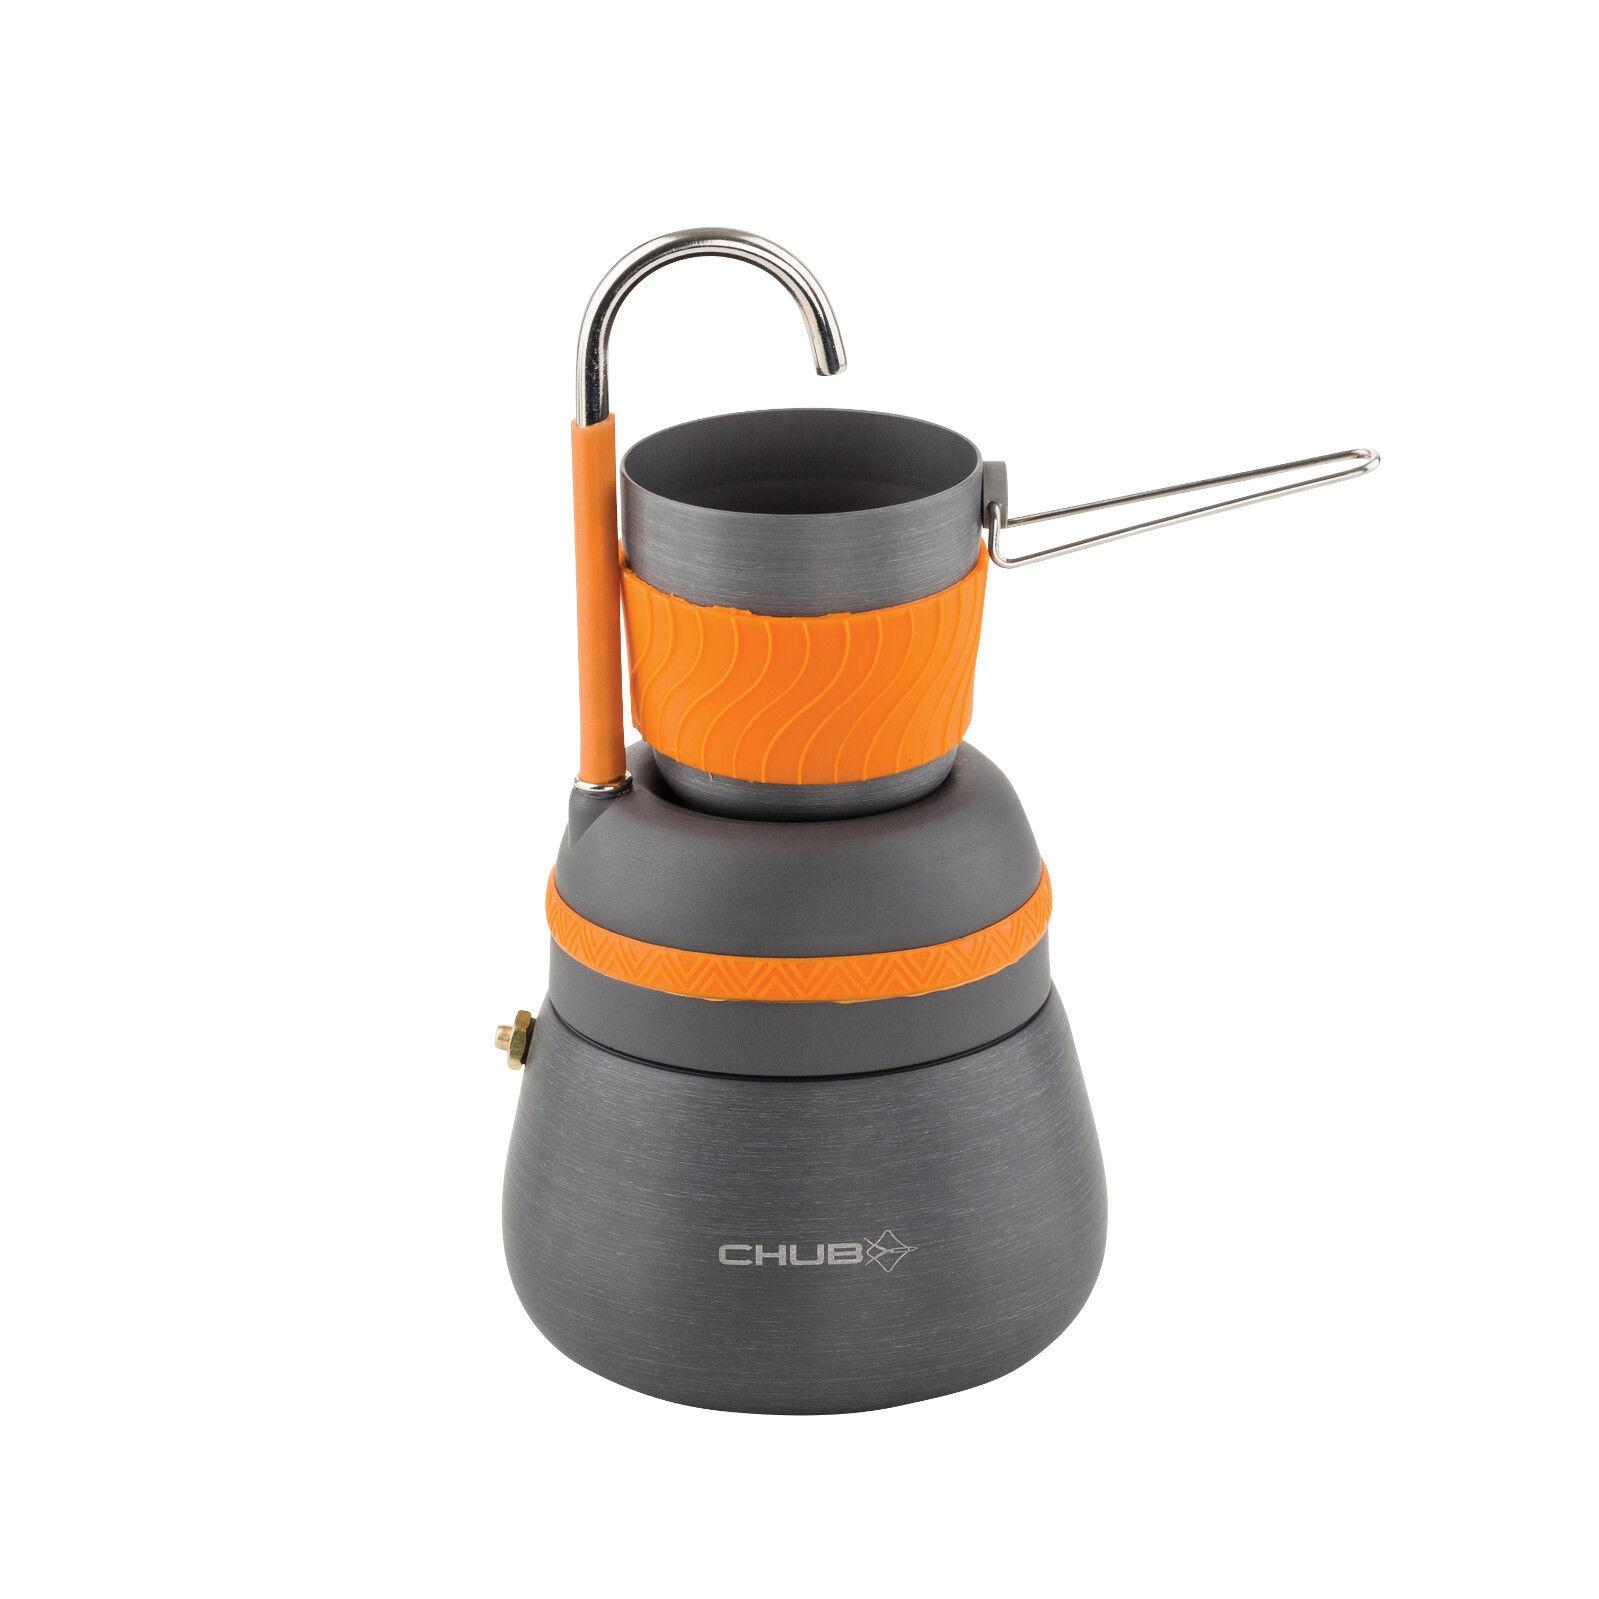 Chub Coffee Maker 1404691 Kaffeekocher Kaffee Kocher Coffeemaker